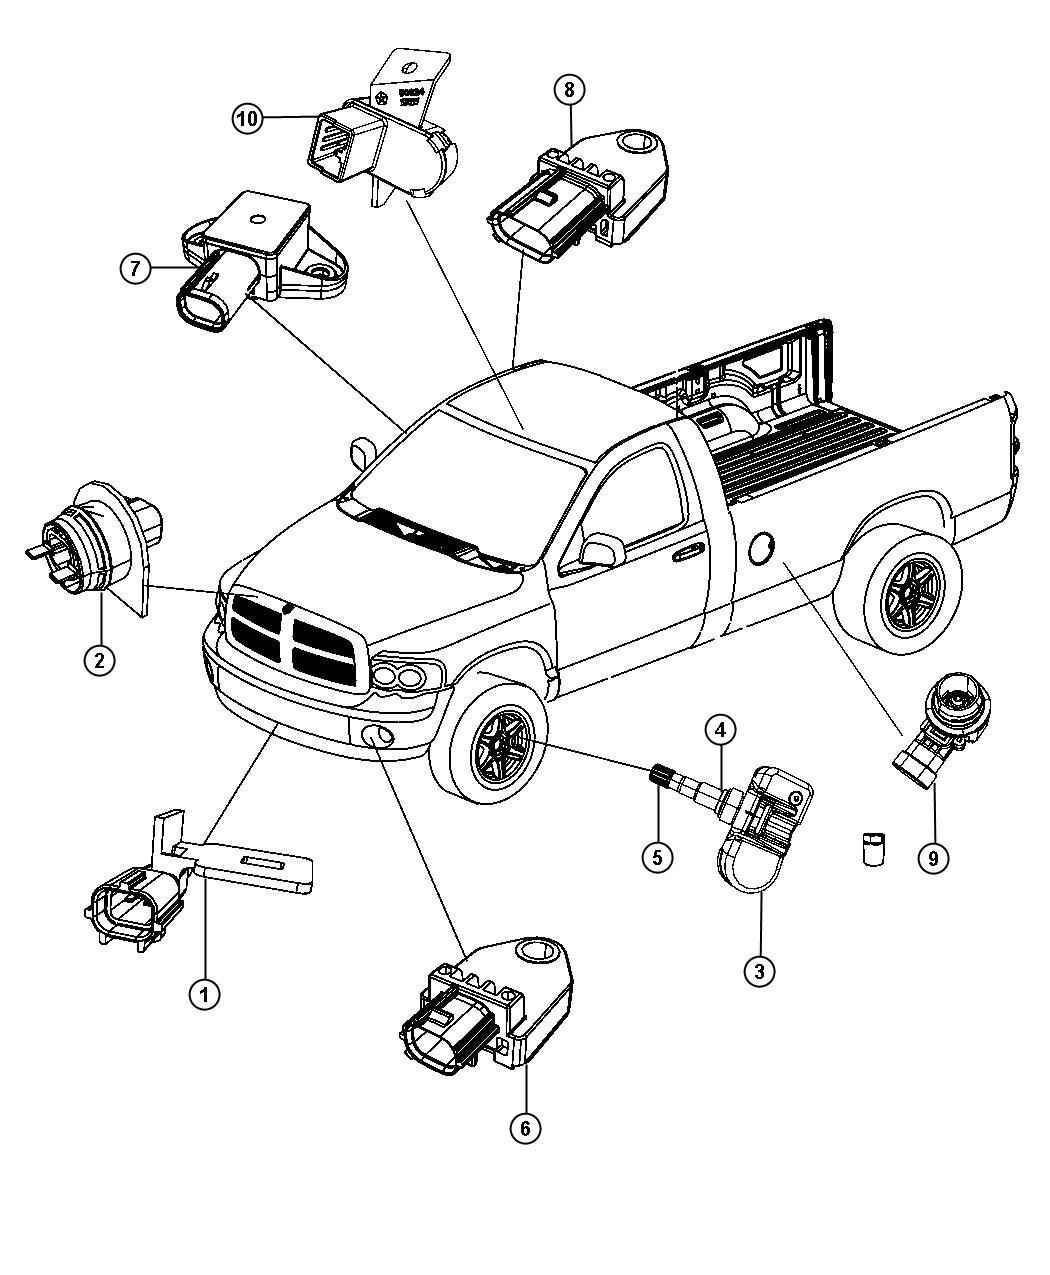 Jeep Liberty Sensor Infrared Trim O0 Rear